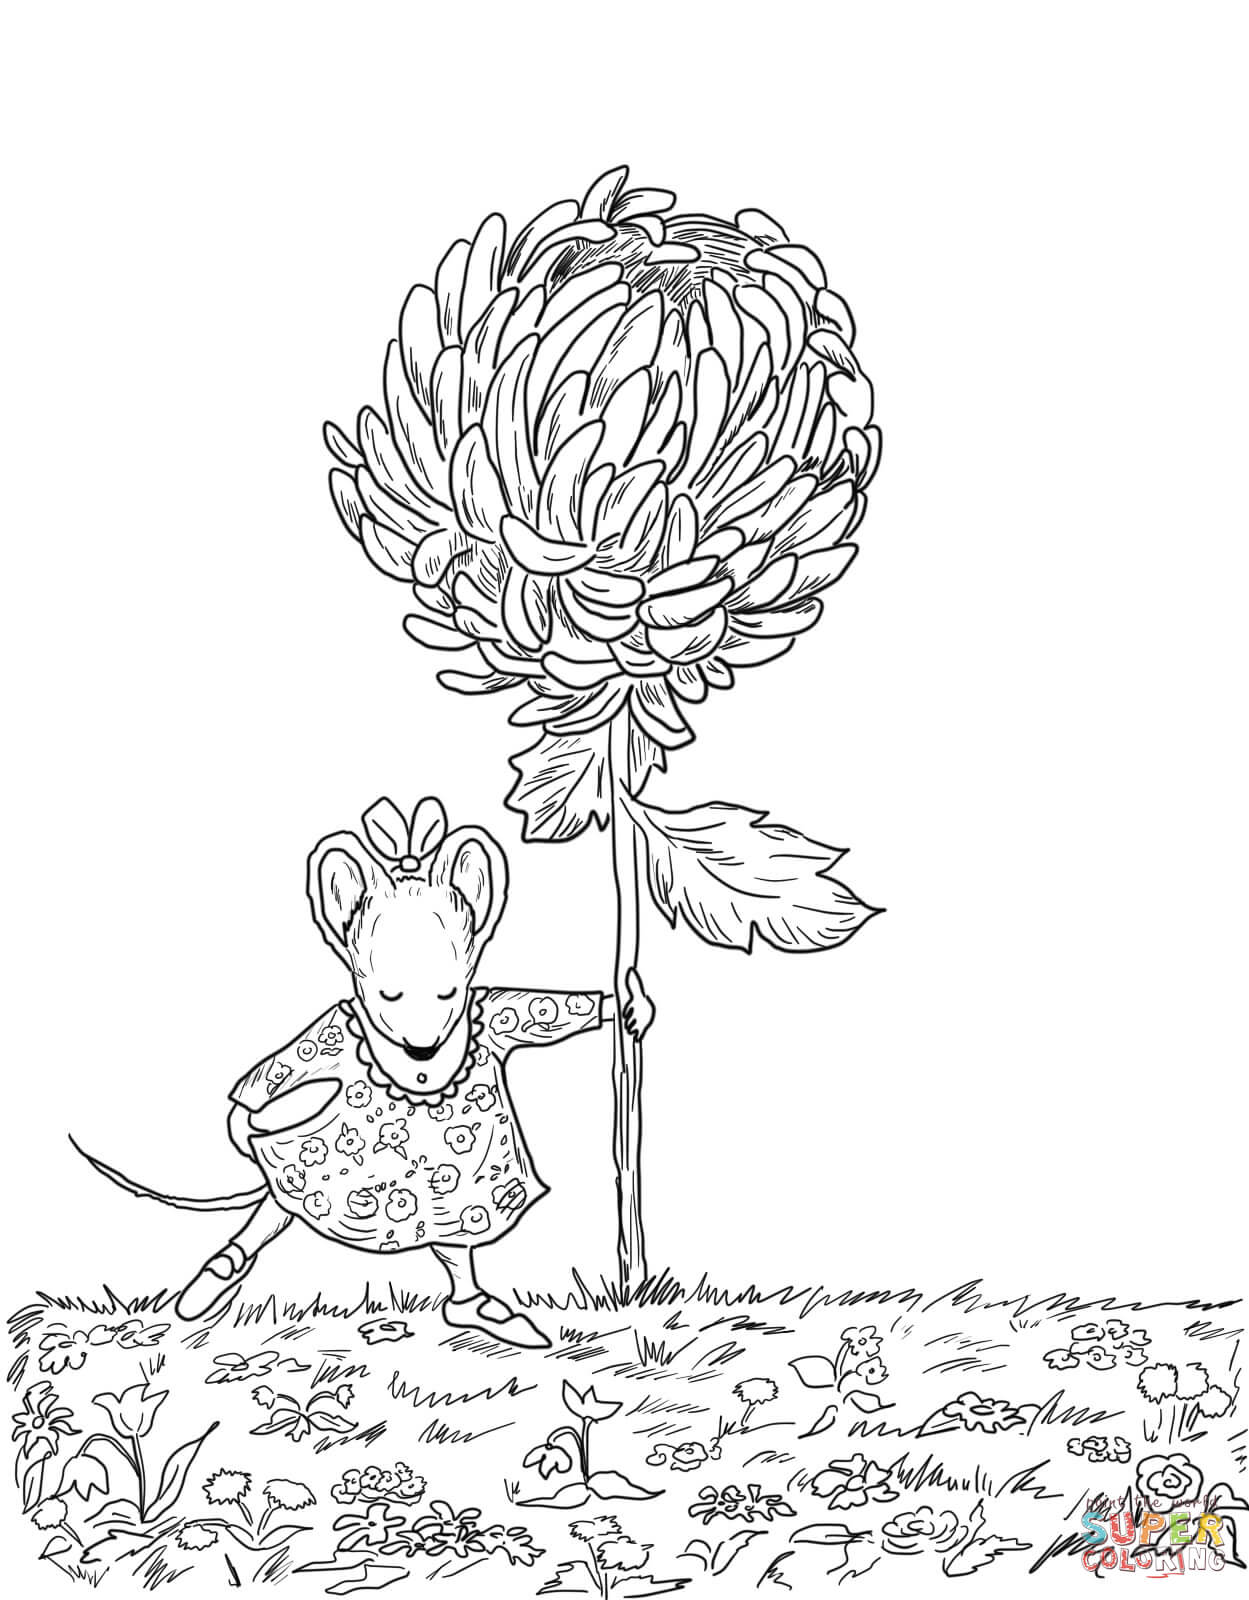 Chrysanthemum Story Map Worksheet